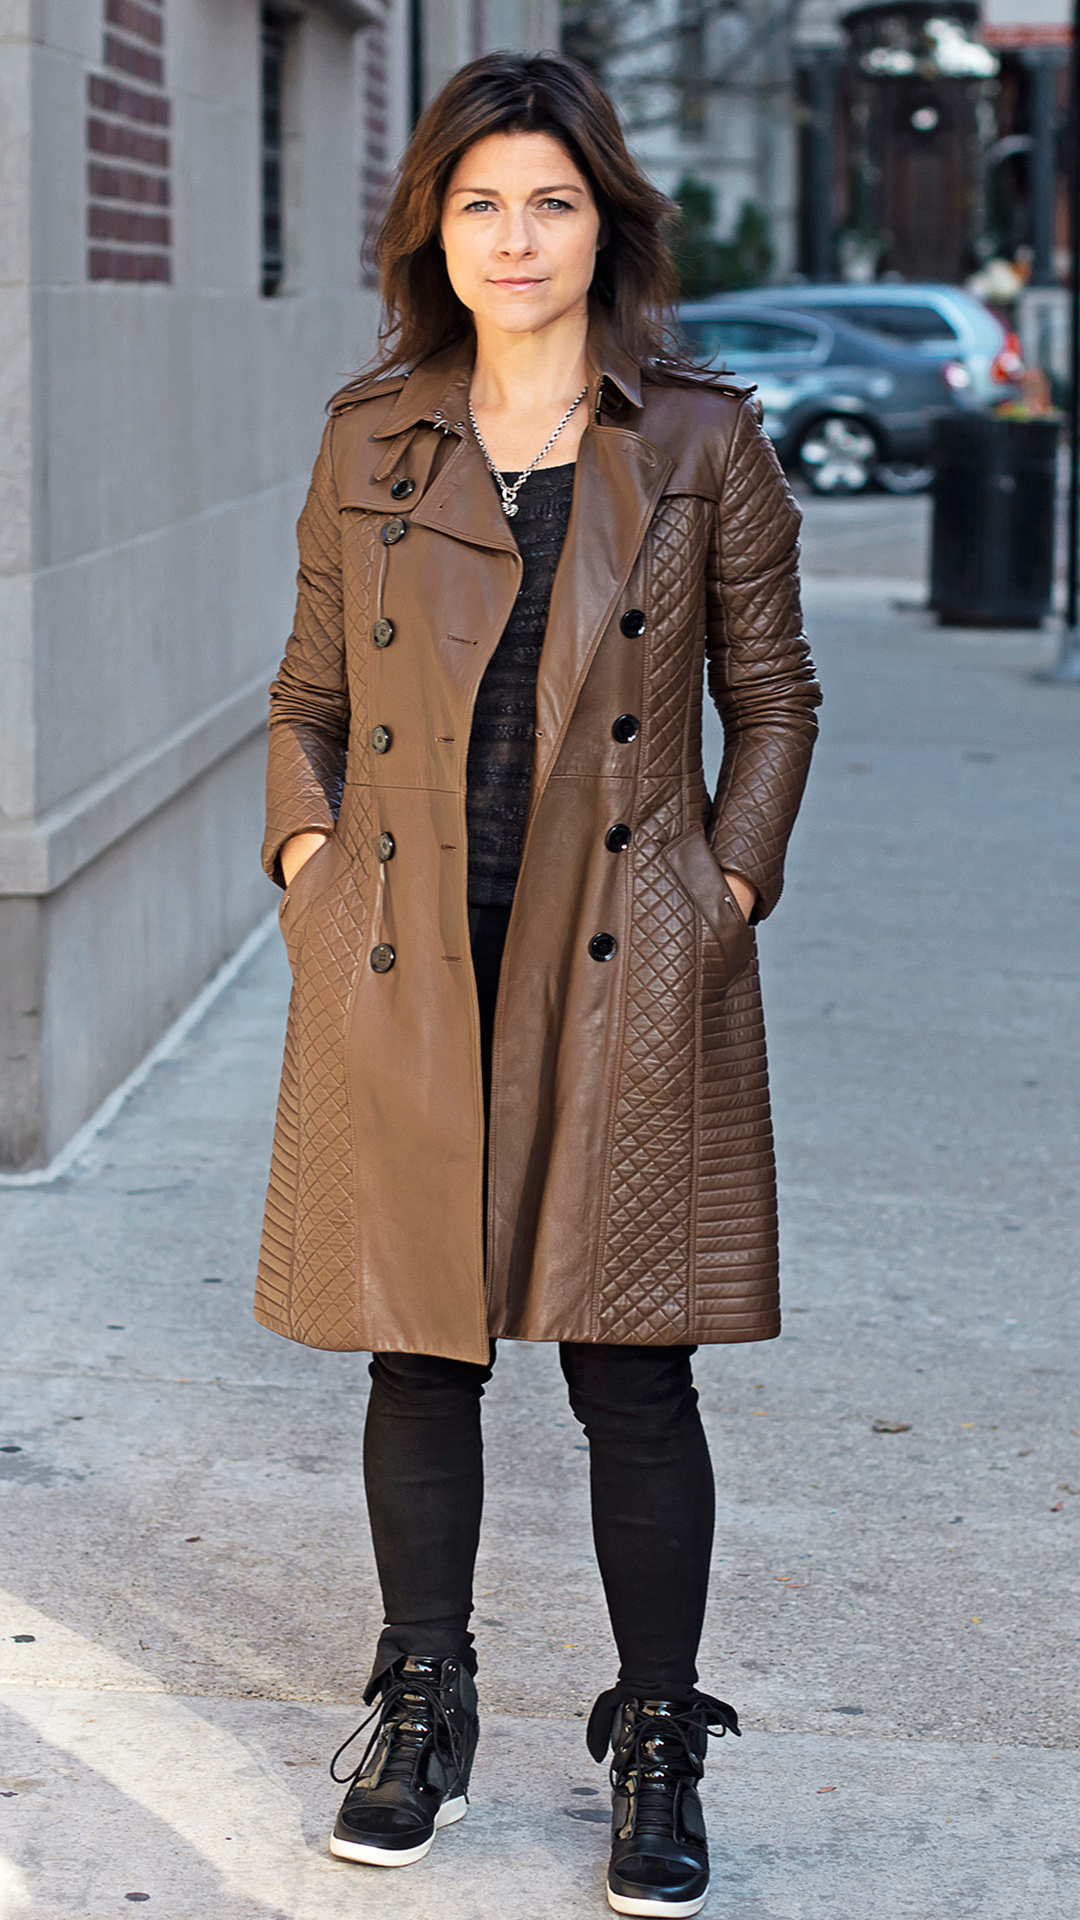 kara mann photographed wearing a seasonal trench coat | art of the